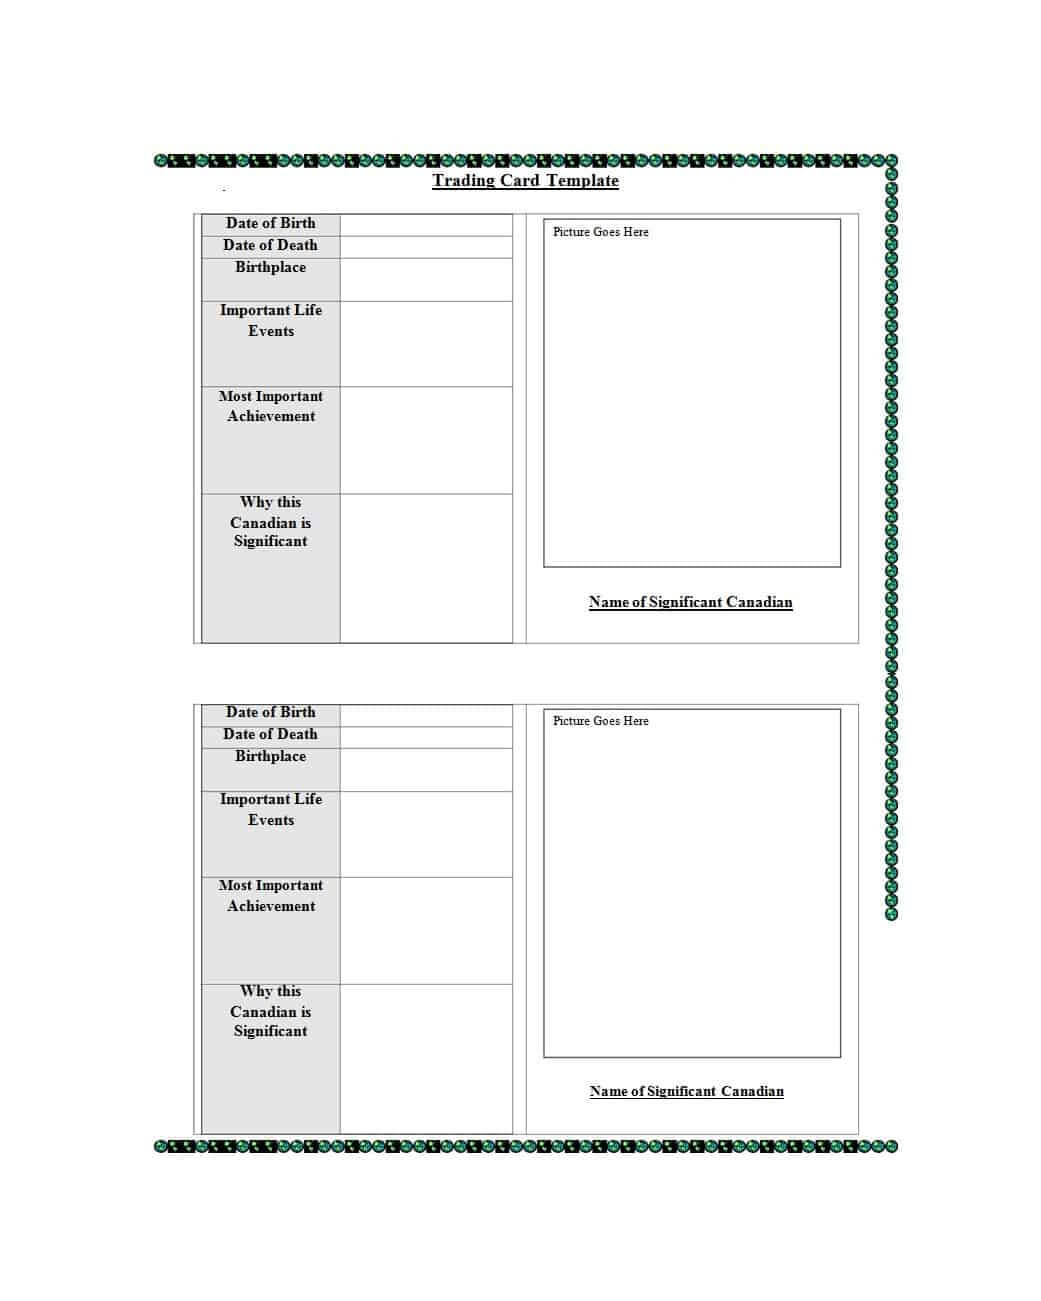 33 Free Trading Card Templates (Baseball, Football, Etc Within Free Trading Card Template Download